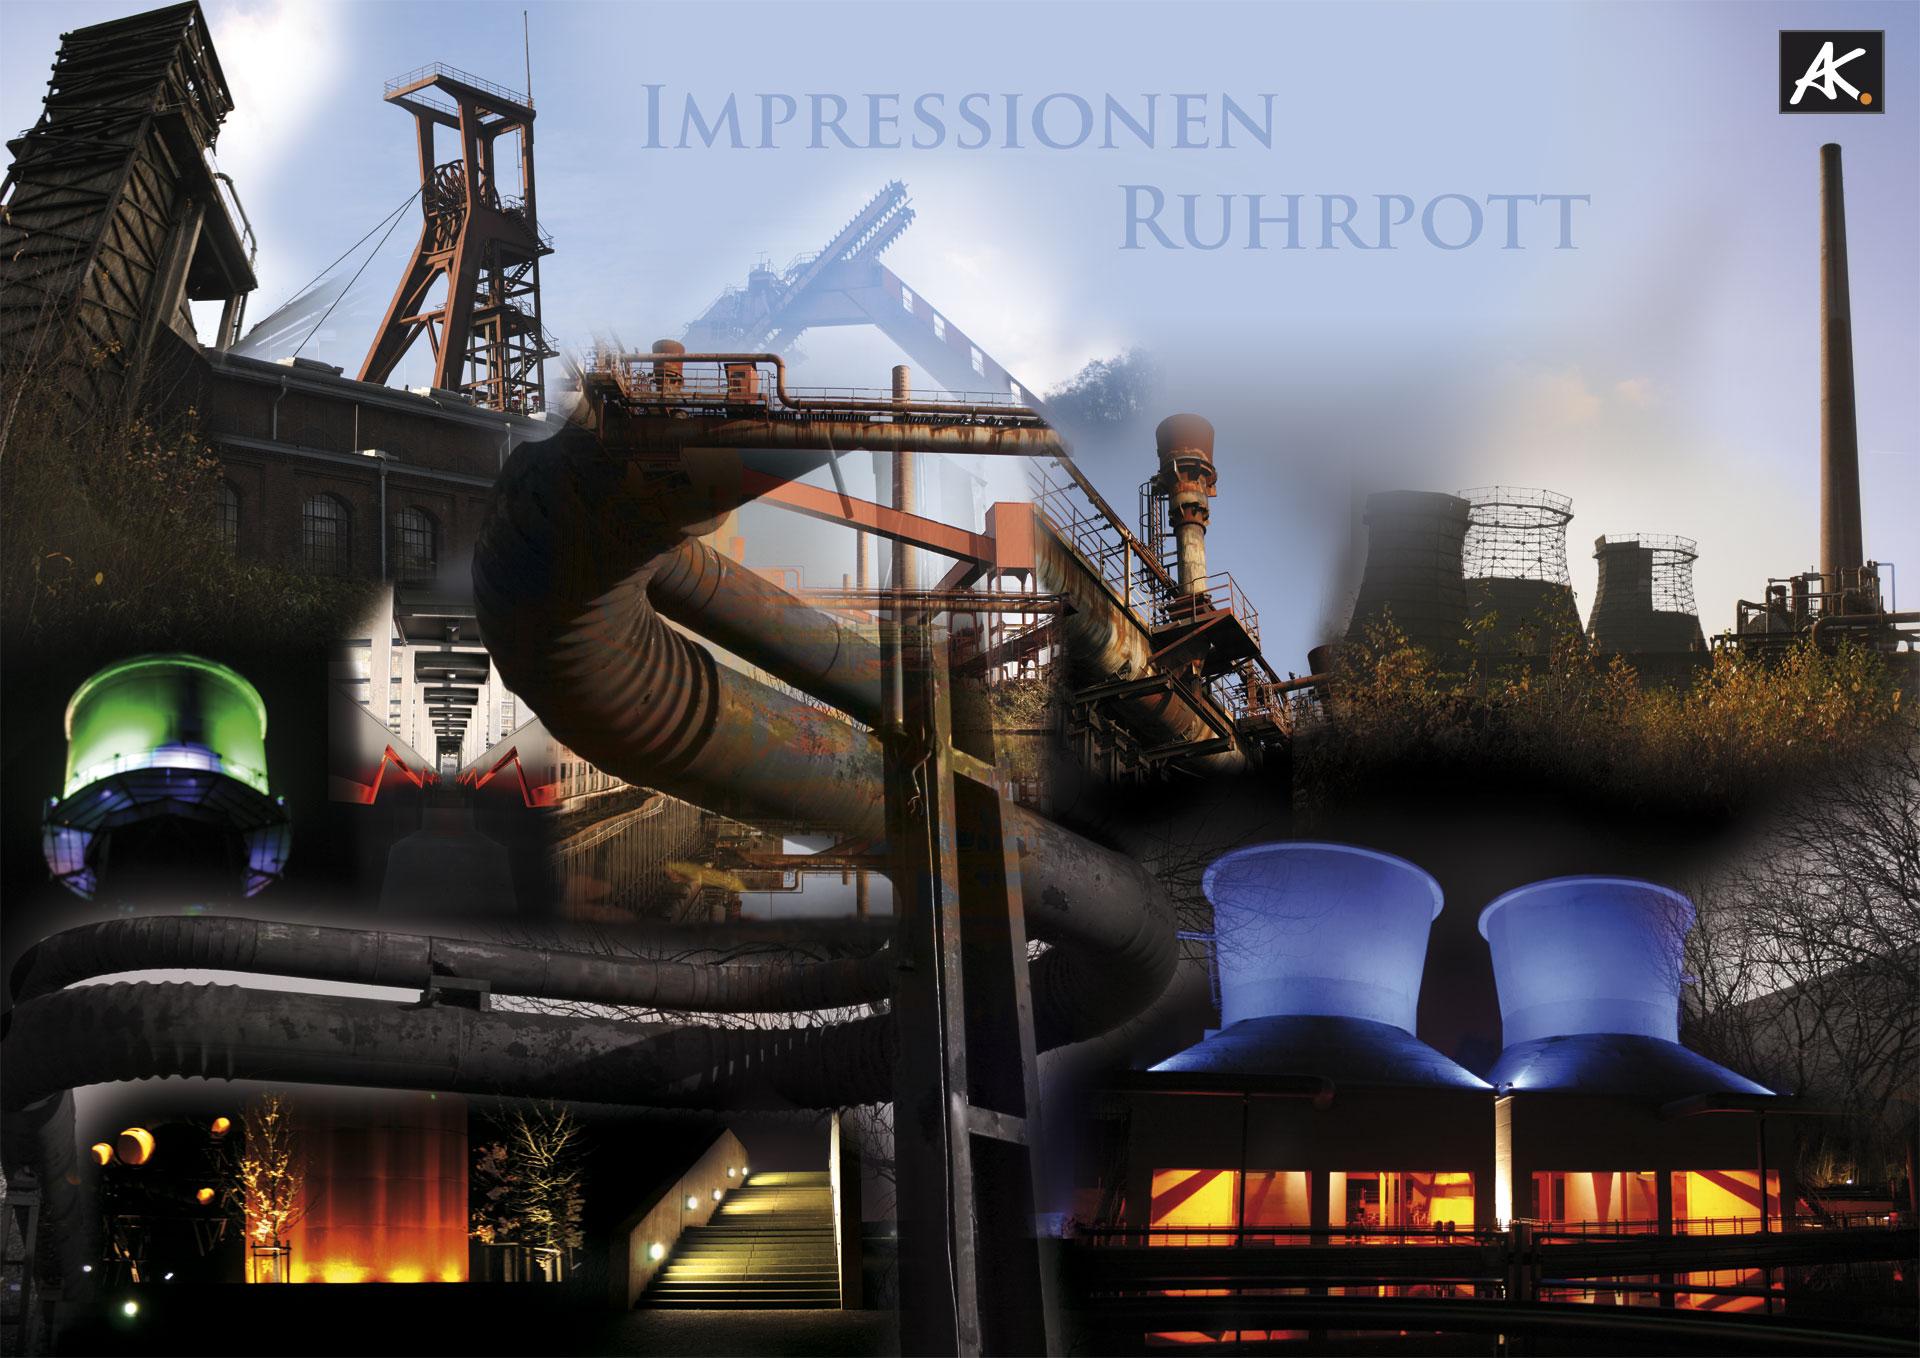 Impressionen im Ruhrpott